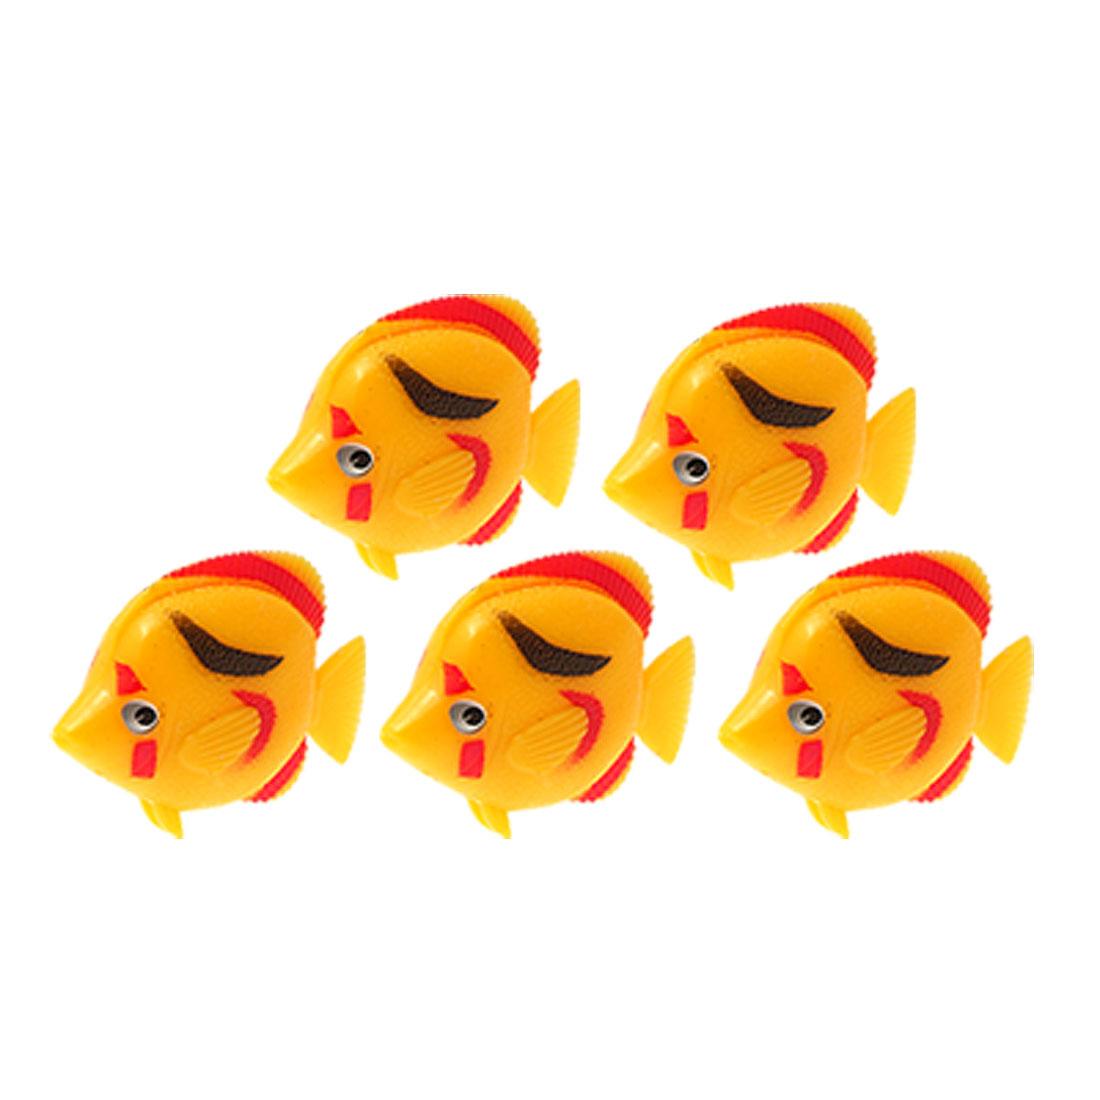 Vivid Yellow Plastic Fish Aquarium Water Tank Decor